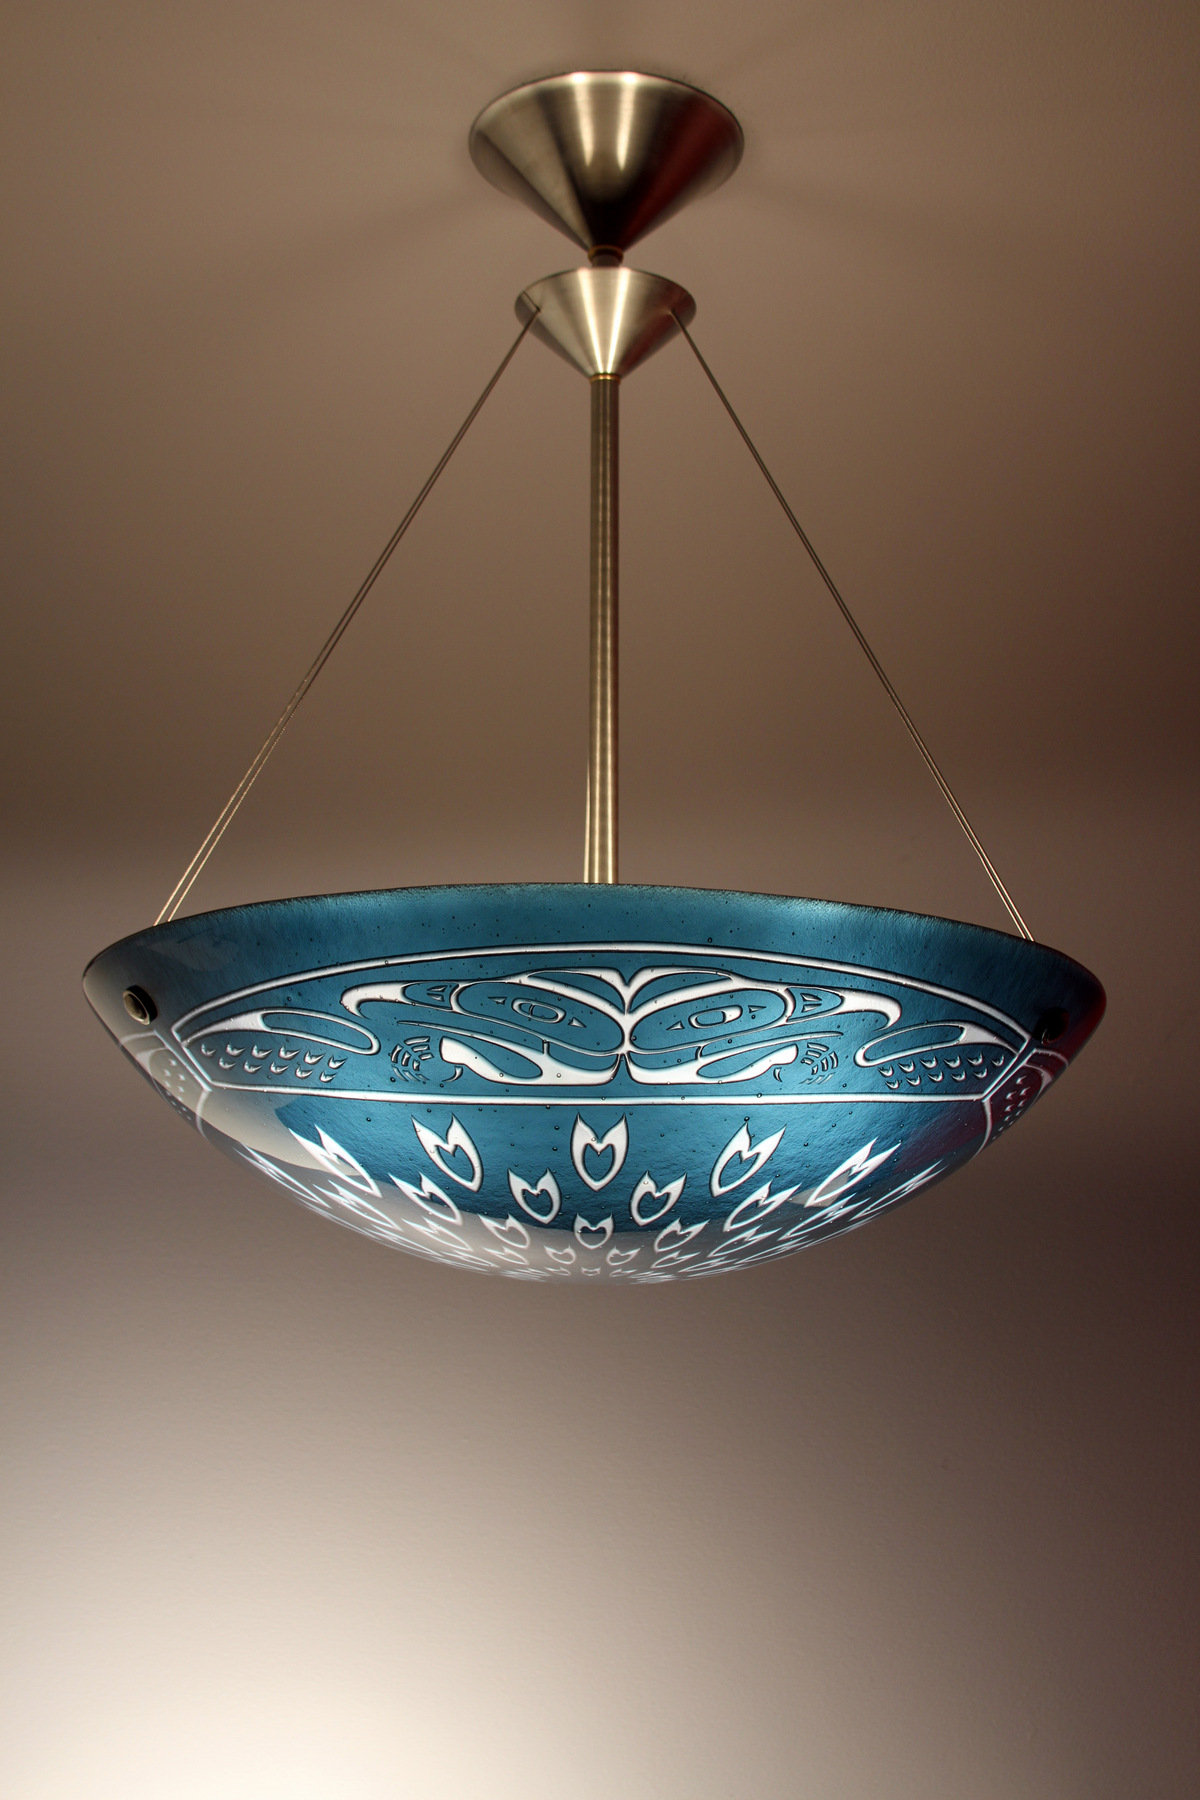 Falcon Pendant Lamp By George Scott Art Glass Pendant